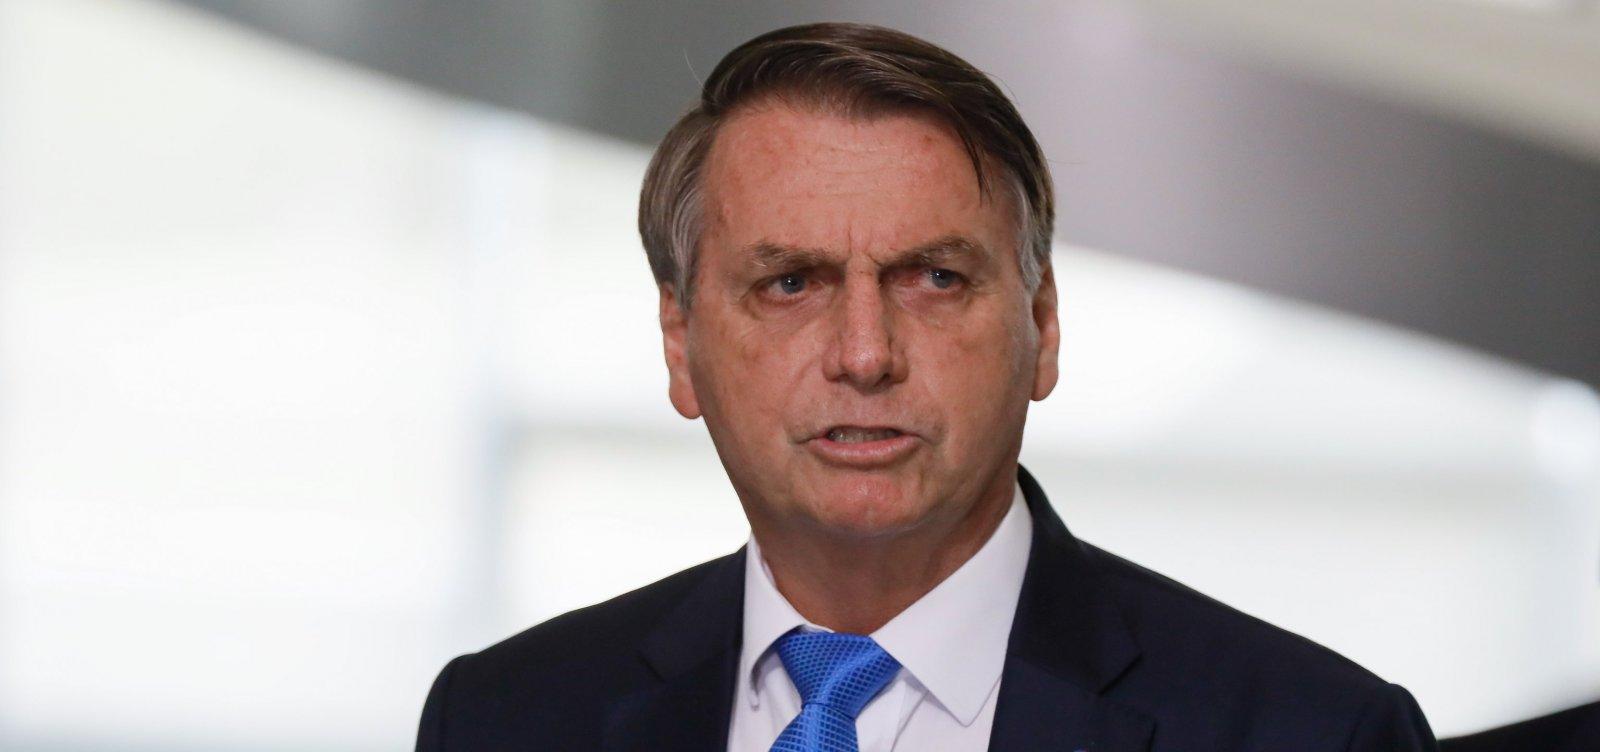 [Senado vota nesta quinta para derrubar decretos de armas de Bolsonaro]